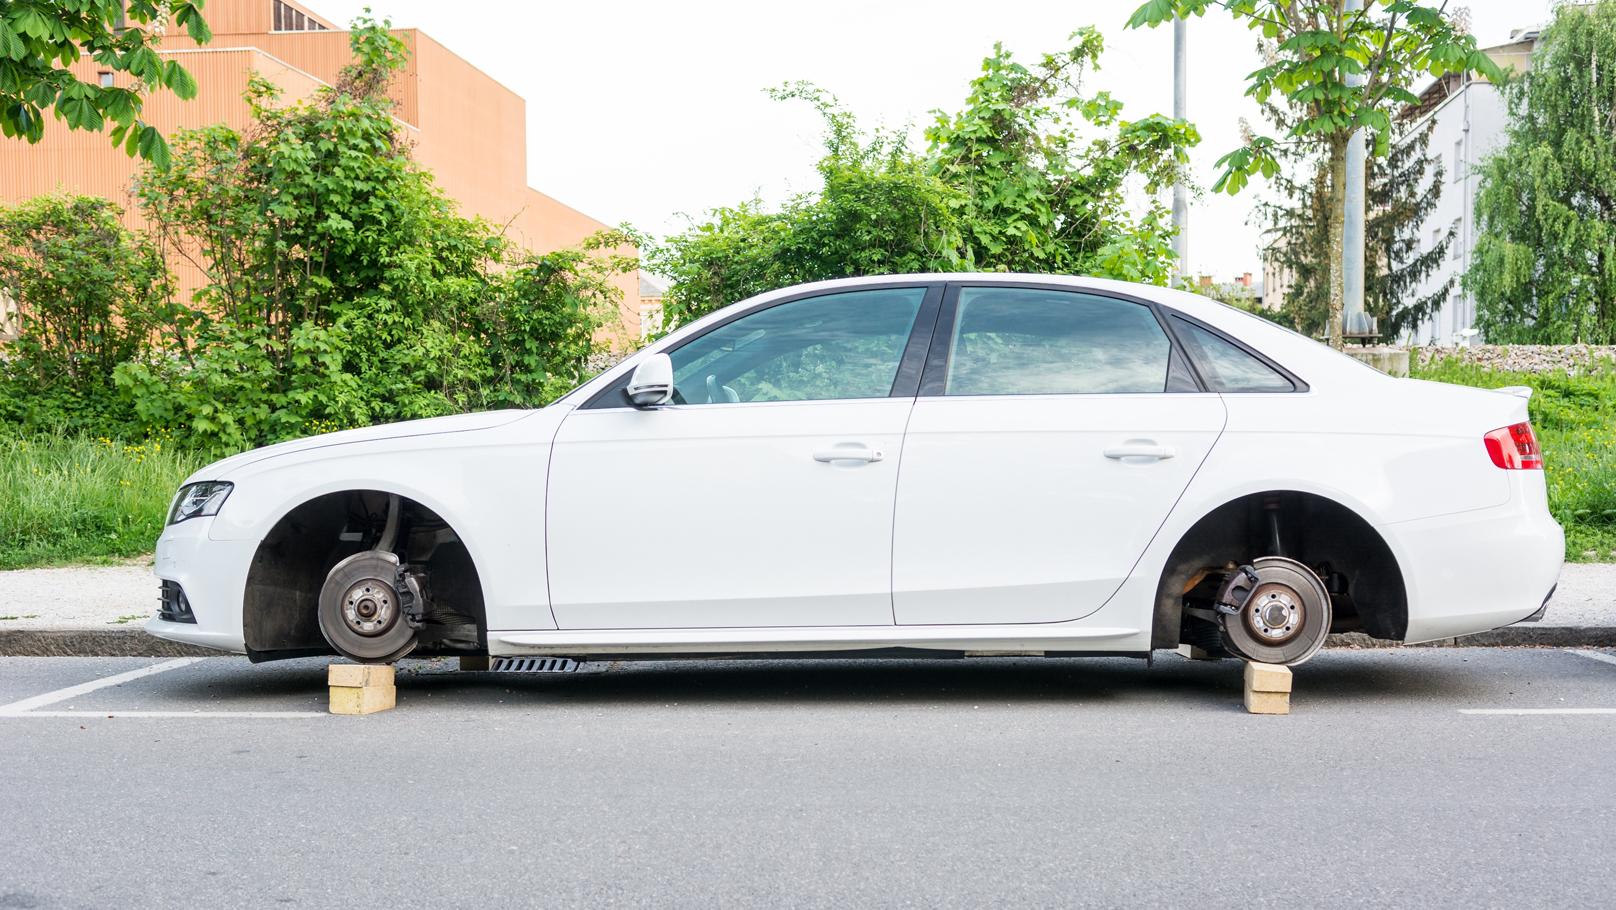 wheel theft